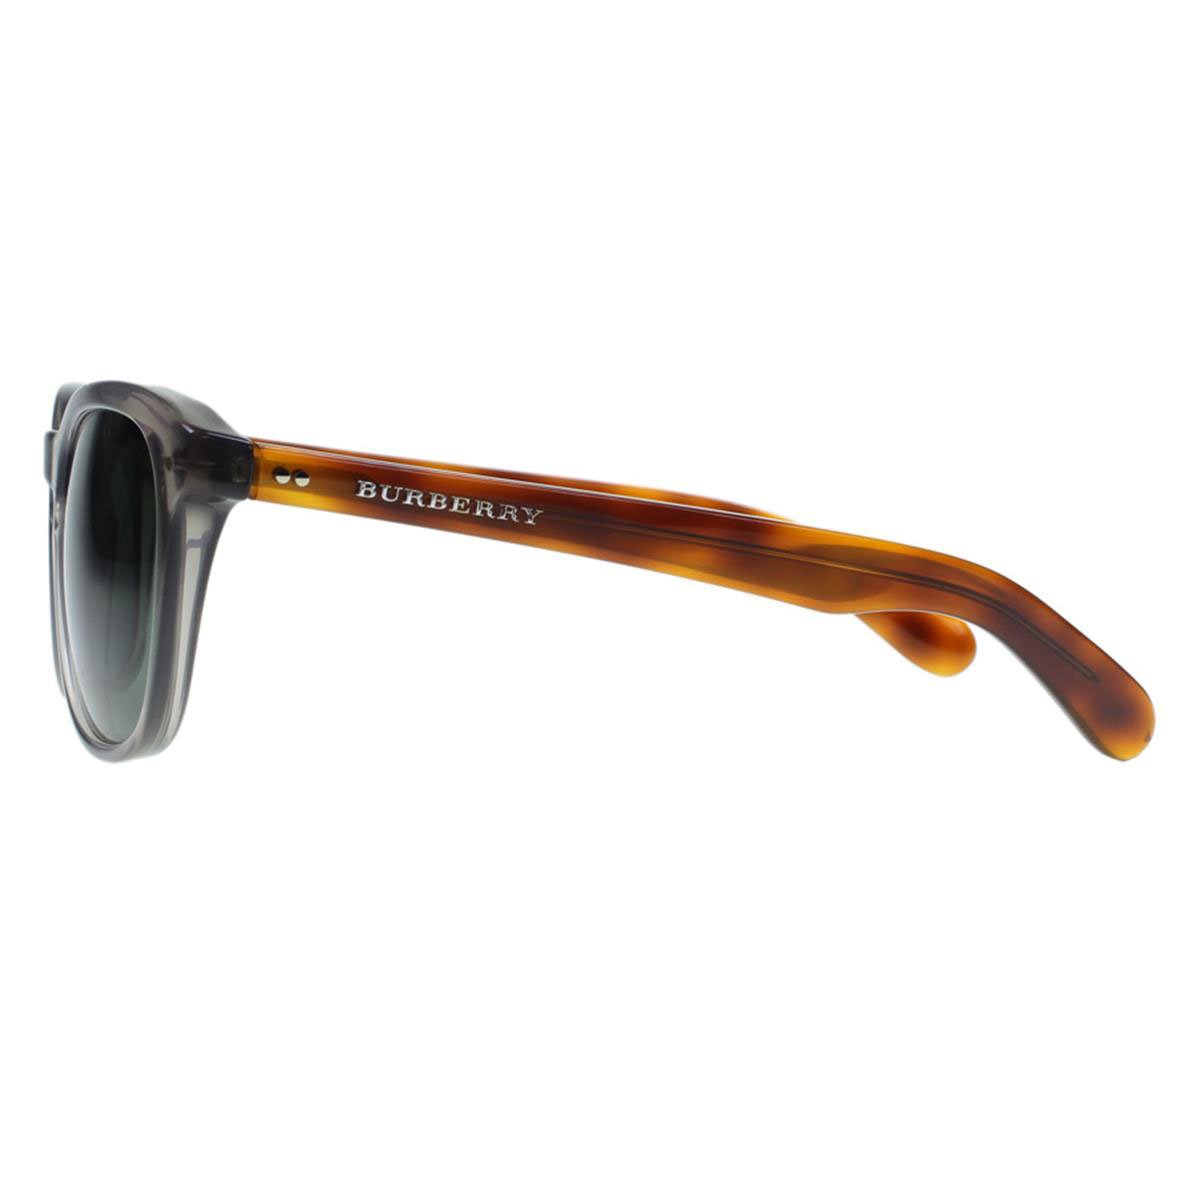 780371cf45c Burberry Men s 0BE4214 355271 55 Sunglasses